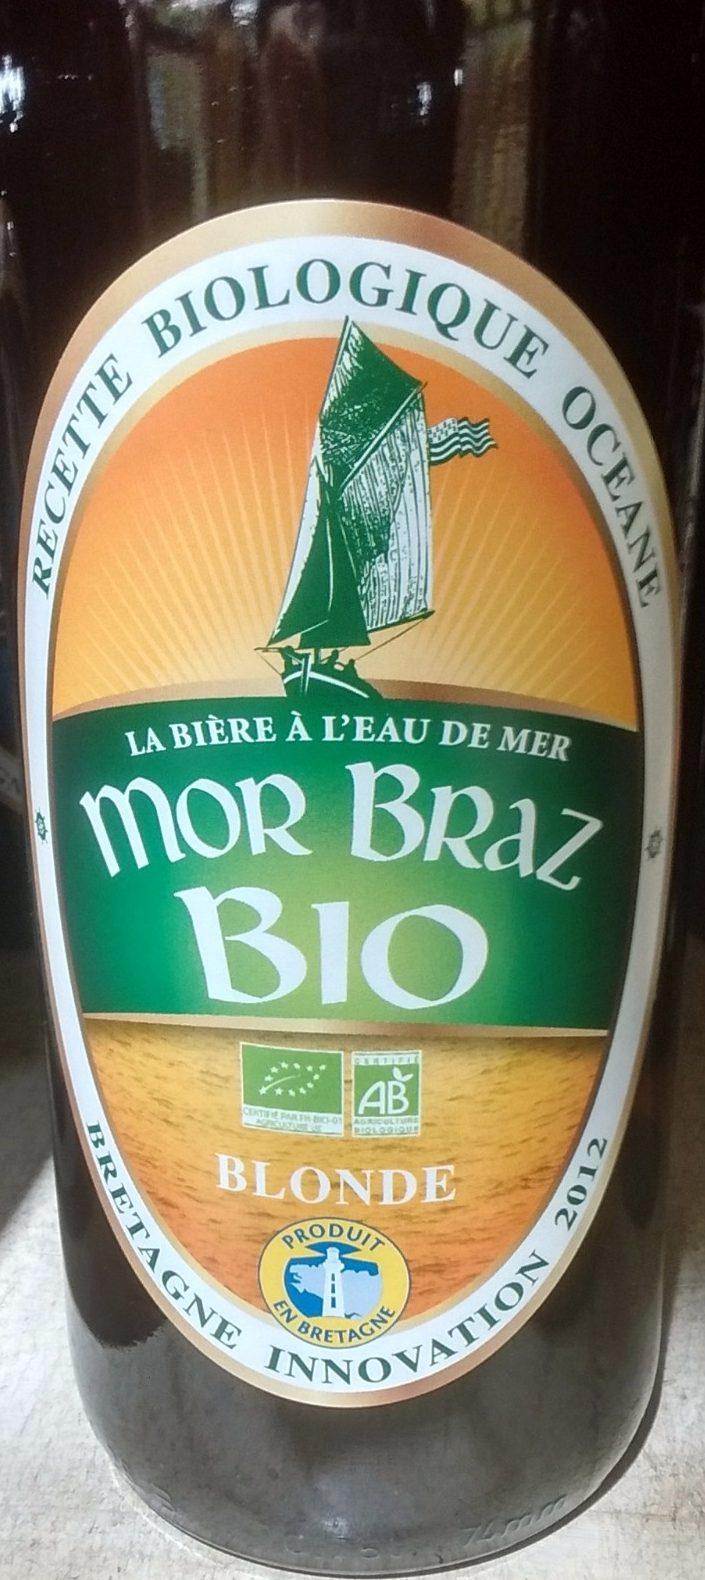 Mor Braz Bio Blonde (5%) - Product - fr